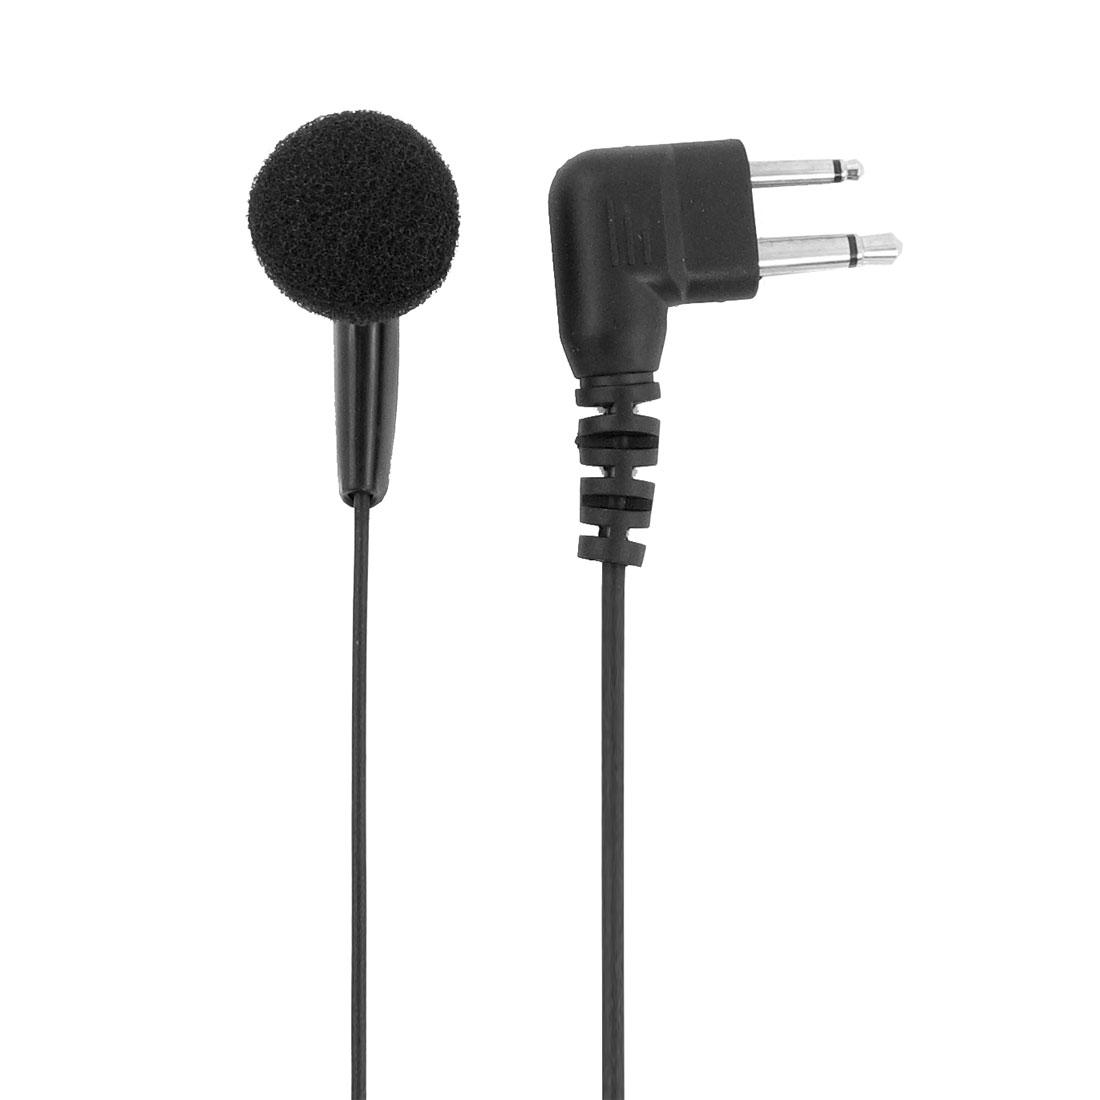 2.5mm 3.5mm Jack Single Side Headset Earphone Black w Clip for Two Way Radio